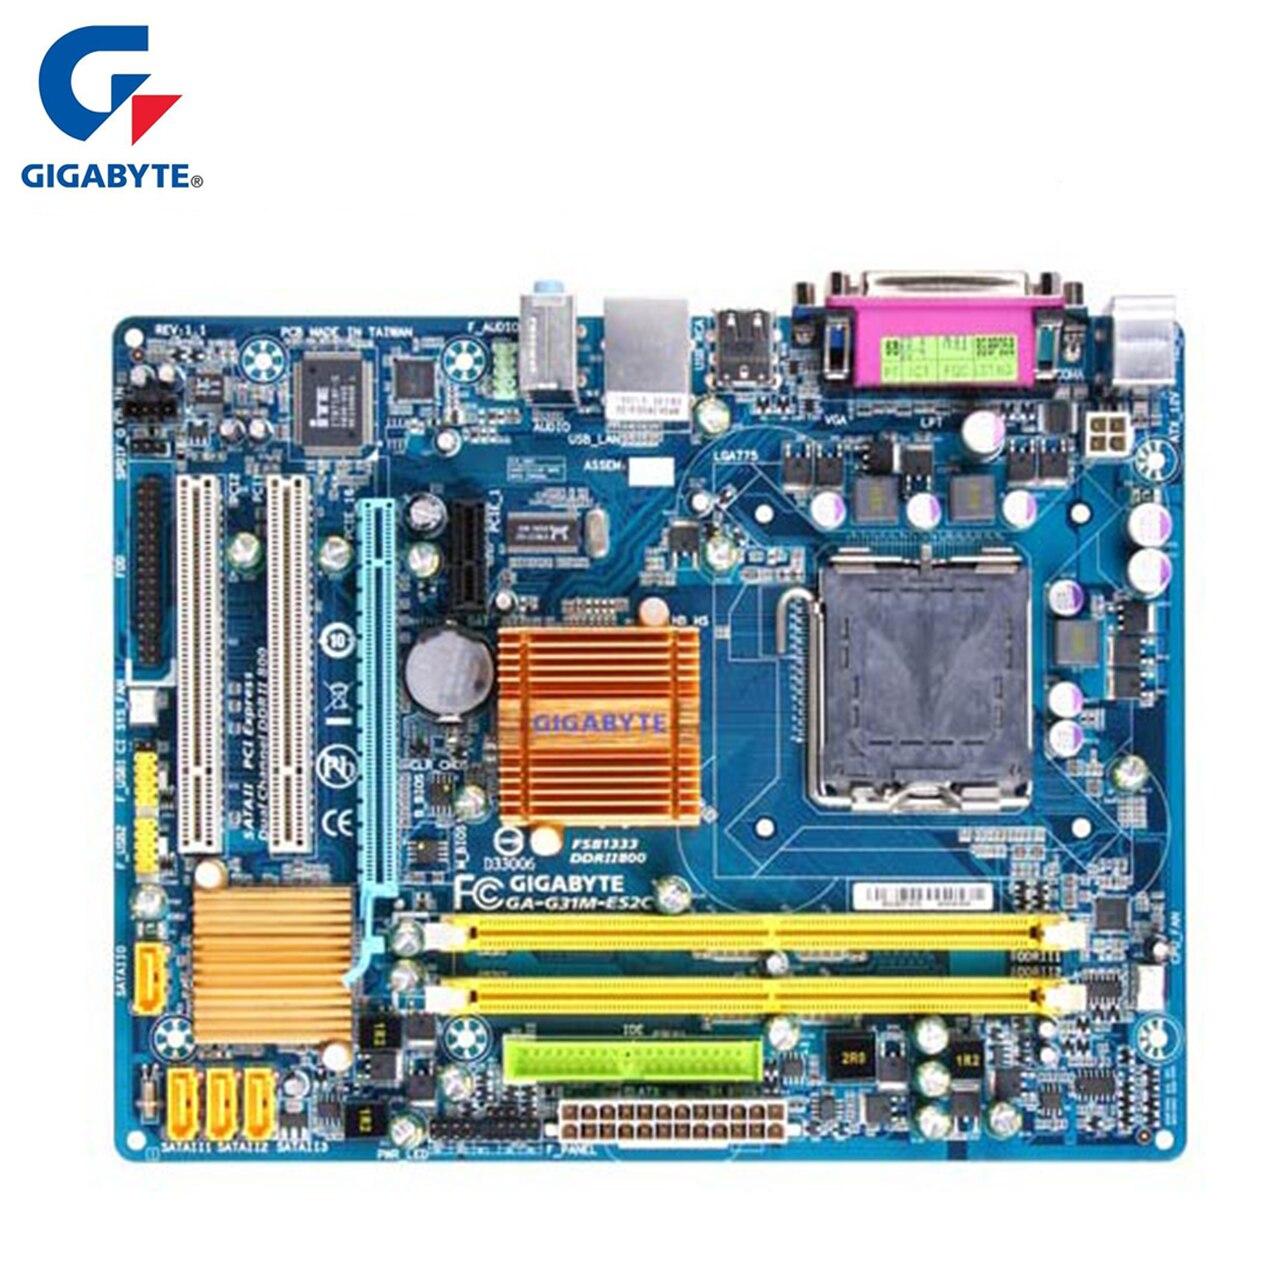 Gigabyte GA-G31M-ES2C 100% Original Motherboard LGA 775 DDR2 4G G31 G31M-ES2C Desktop Mainboard SATA II Systemboard Used